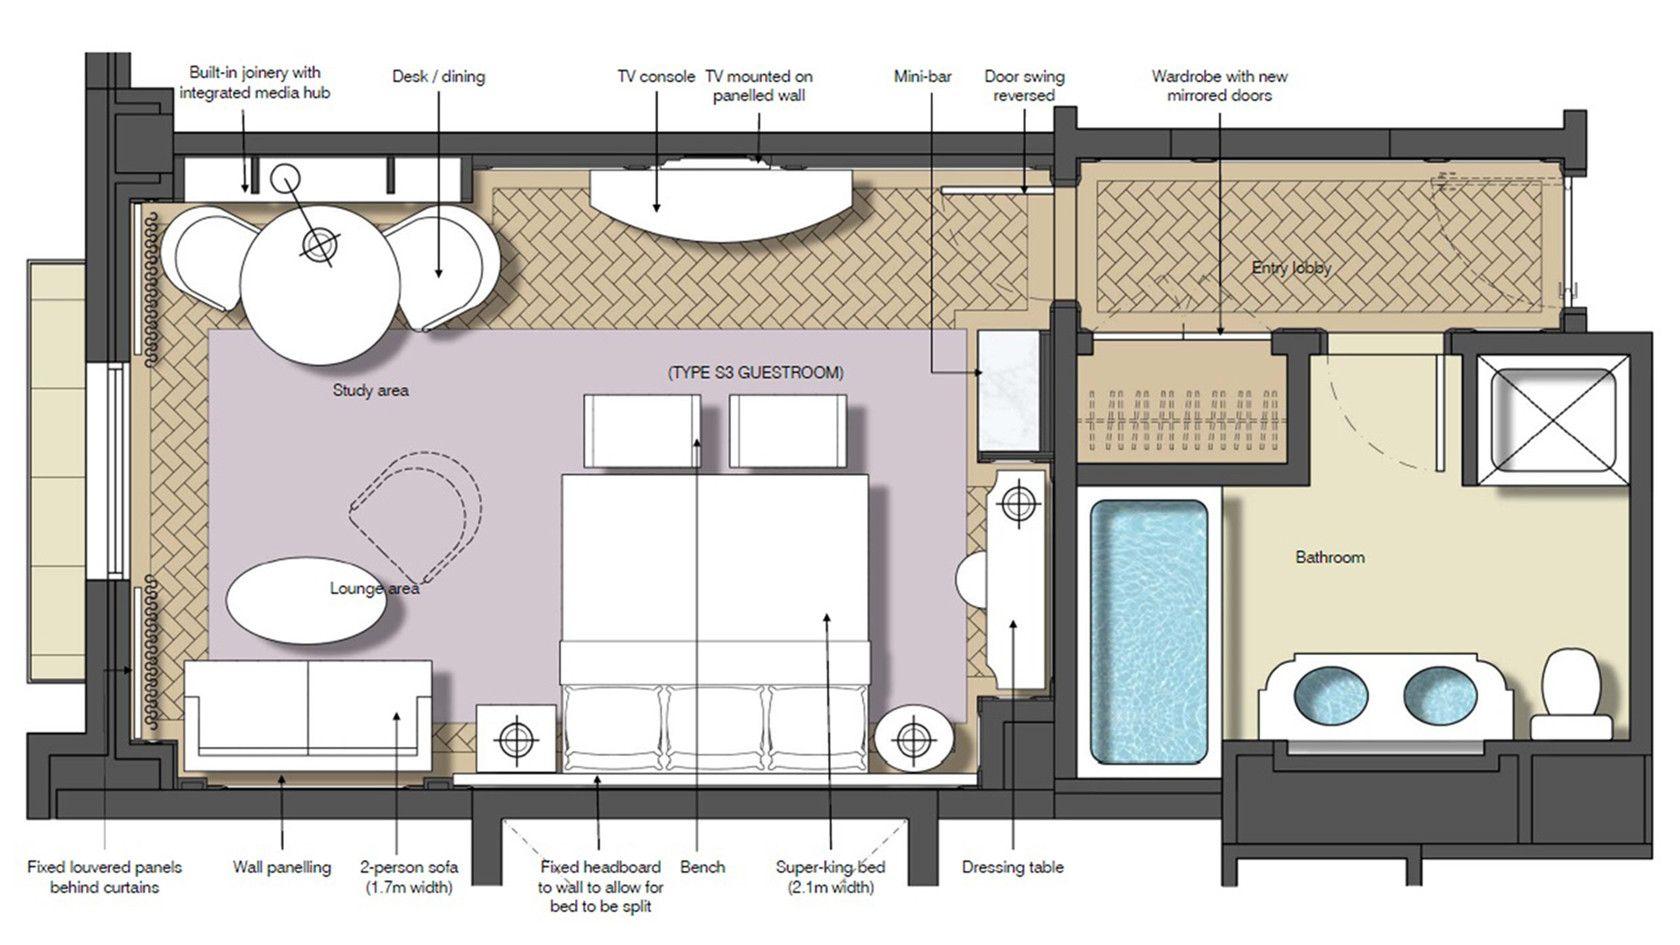 Deluxe Room Hotel Room Design Luxury Hotel Room Hotel Room Plan